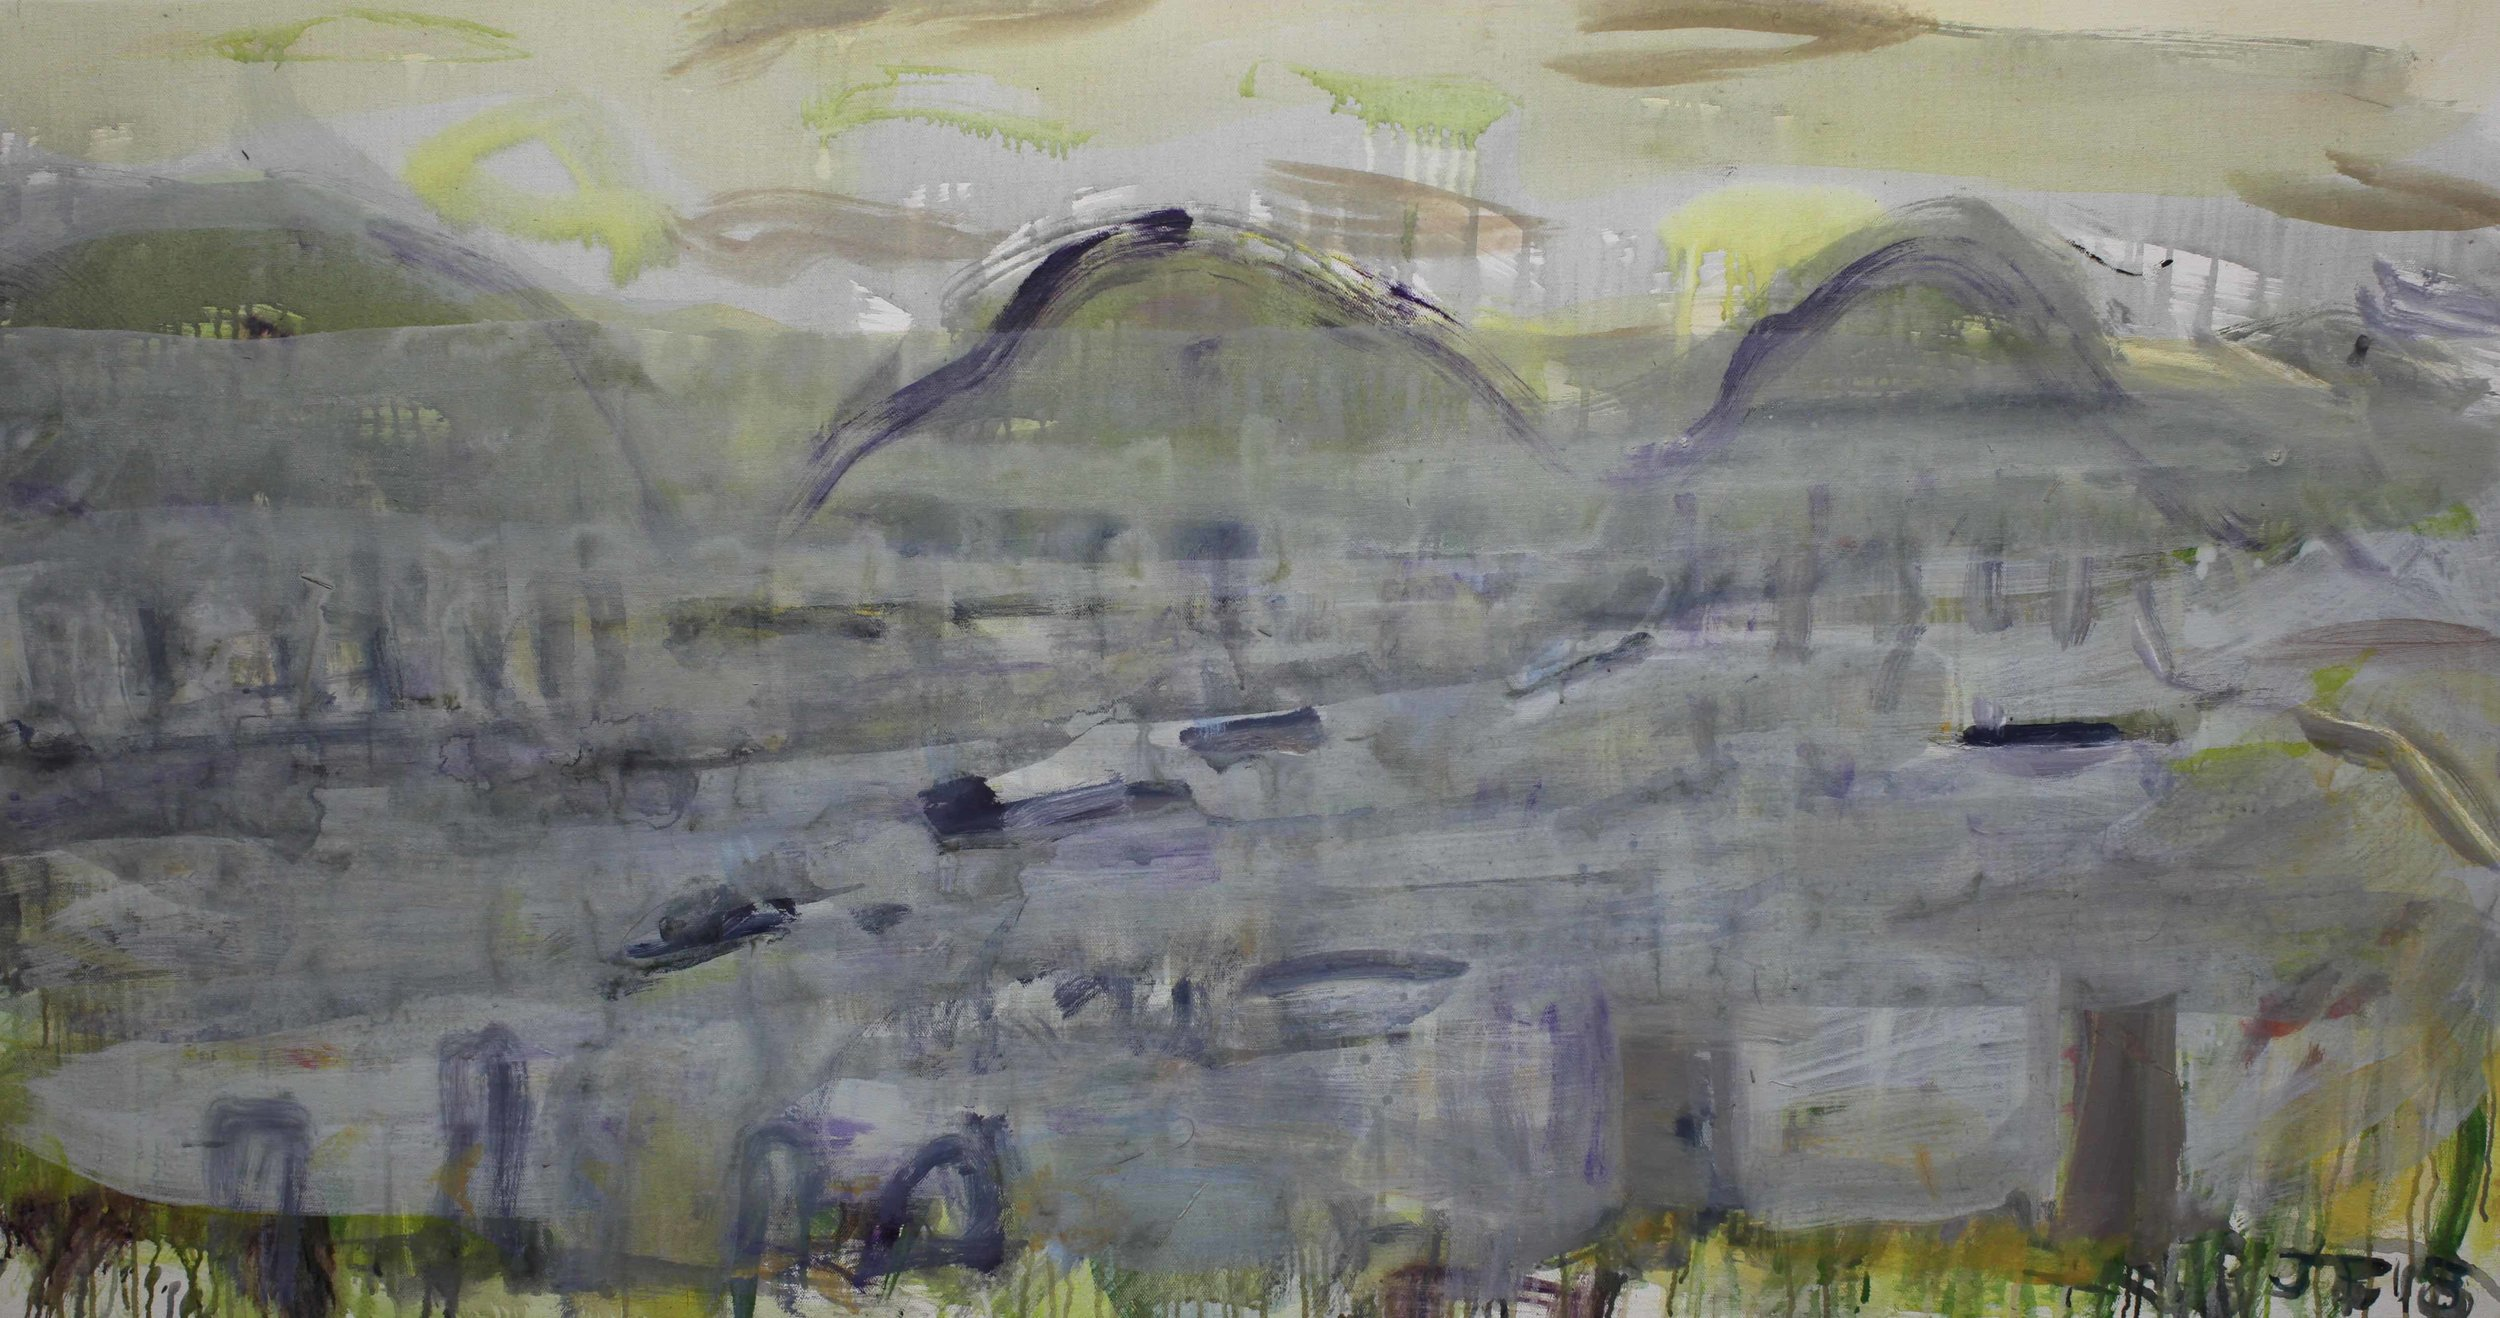 Joe Furlonger_Hong Kong through TY tower_2018_Acrylic on canvas_88x155cm_19,000AUD copy.jpg